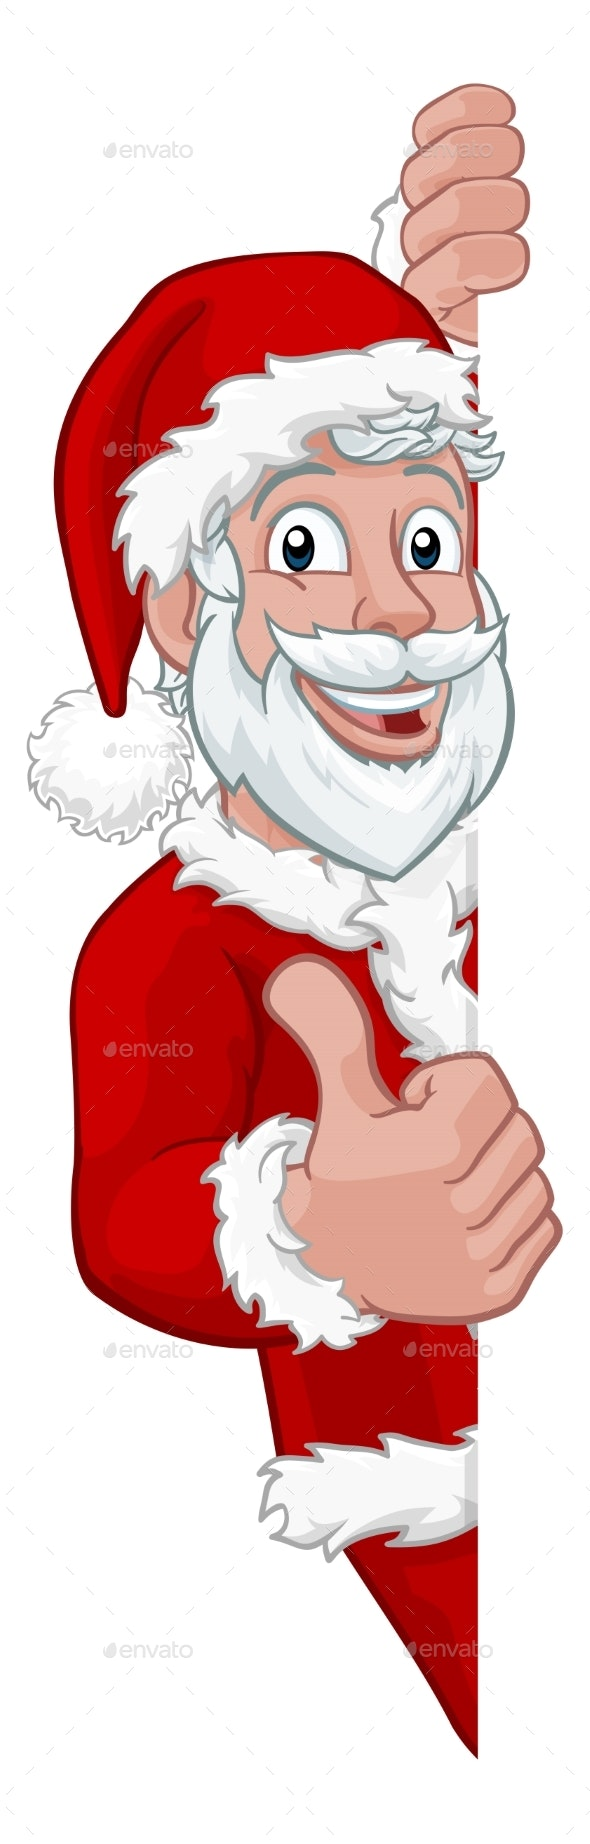 Young Santa Christmas Cartoon Sign Thumbs Up - Christmas Seasons/Holidays